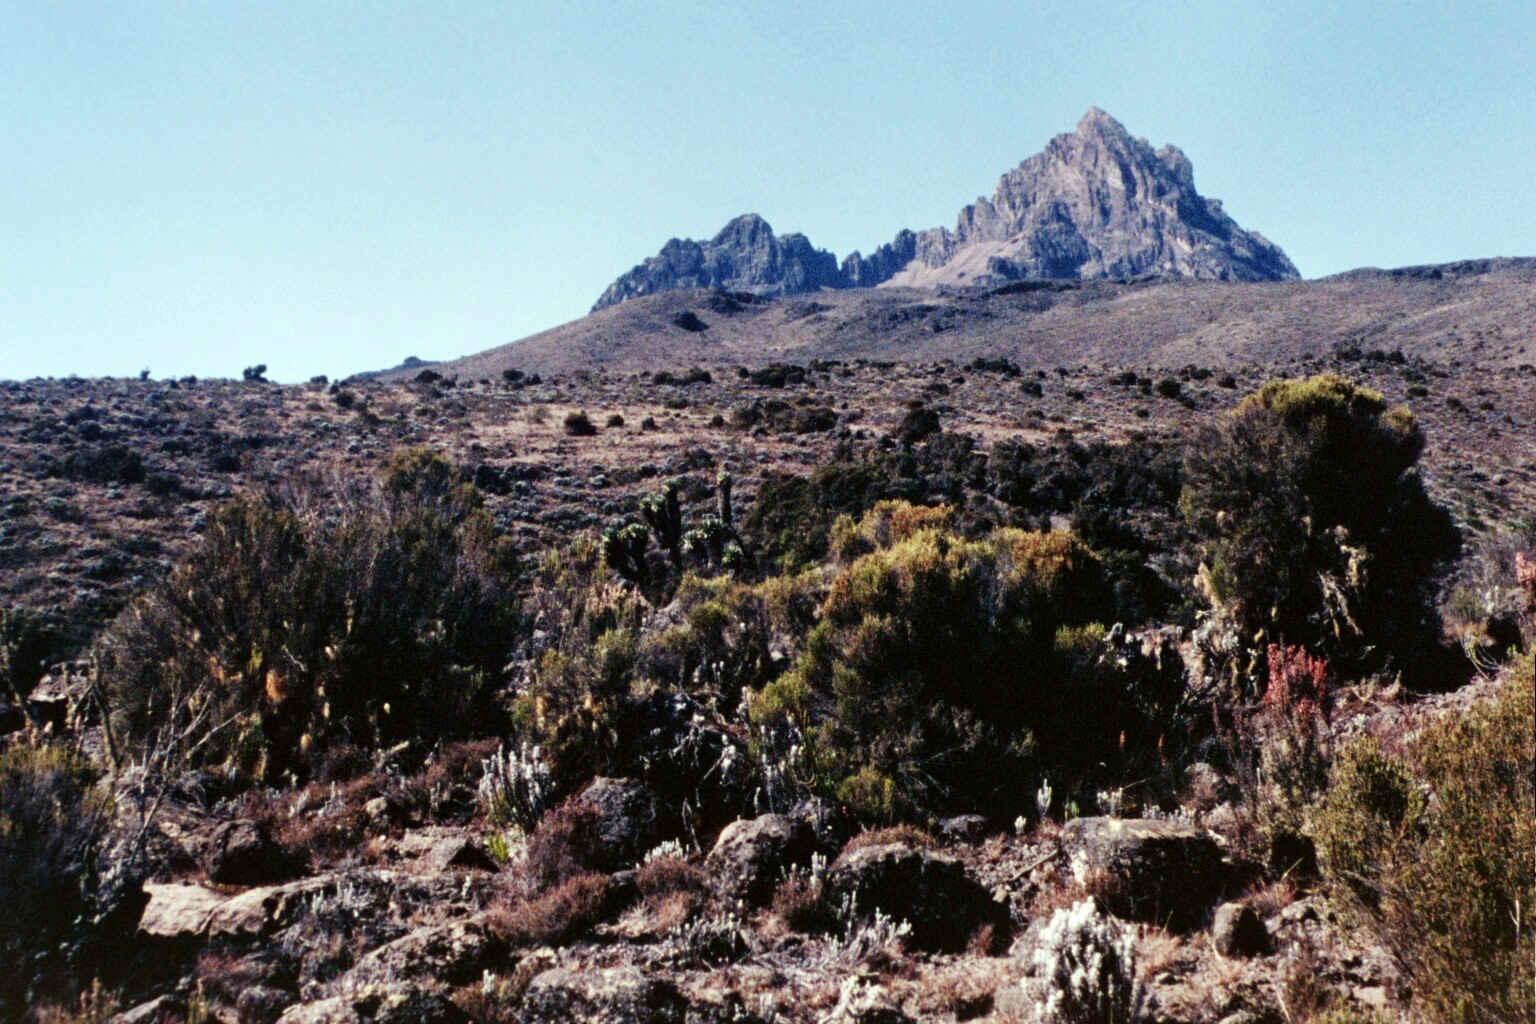 wp-content/uploads/itineraries/Kilimanjaro/kili-rongai-day3.jpg